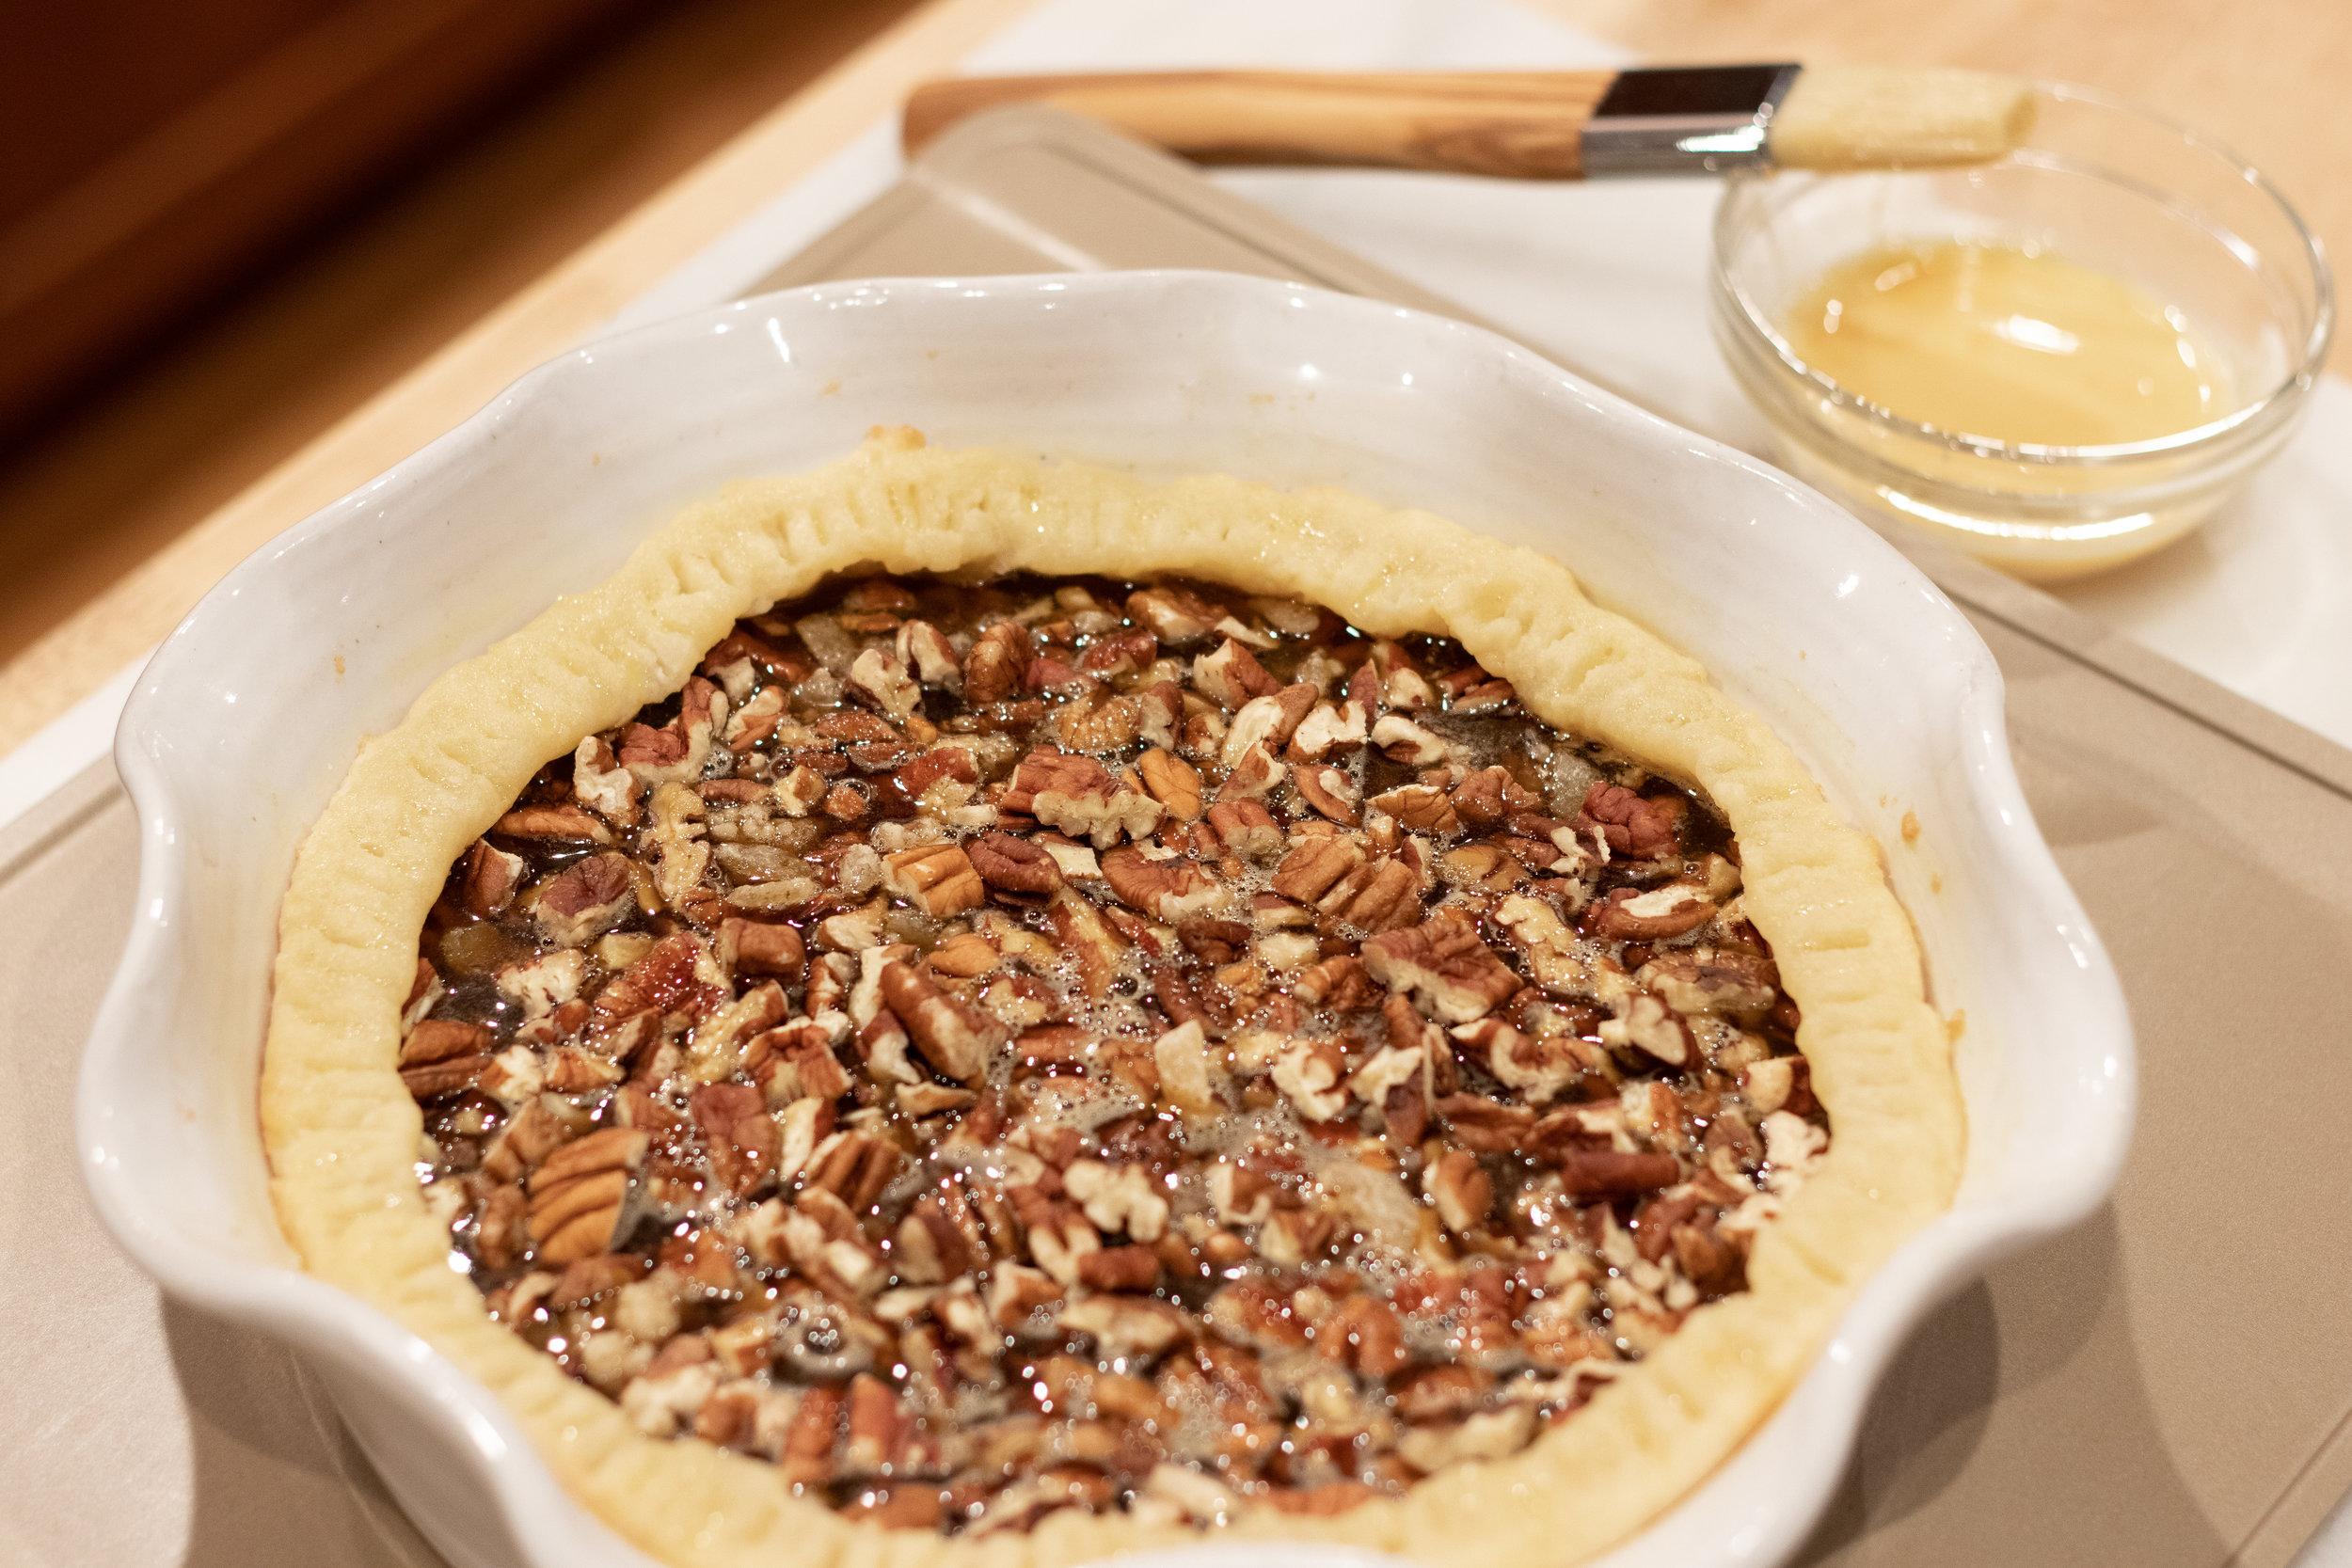 Maple Bourbon Pecan Pie Filling